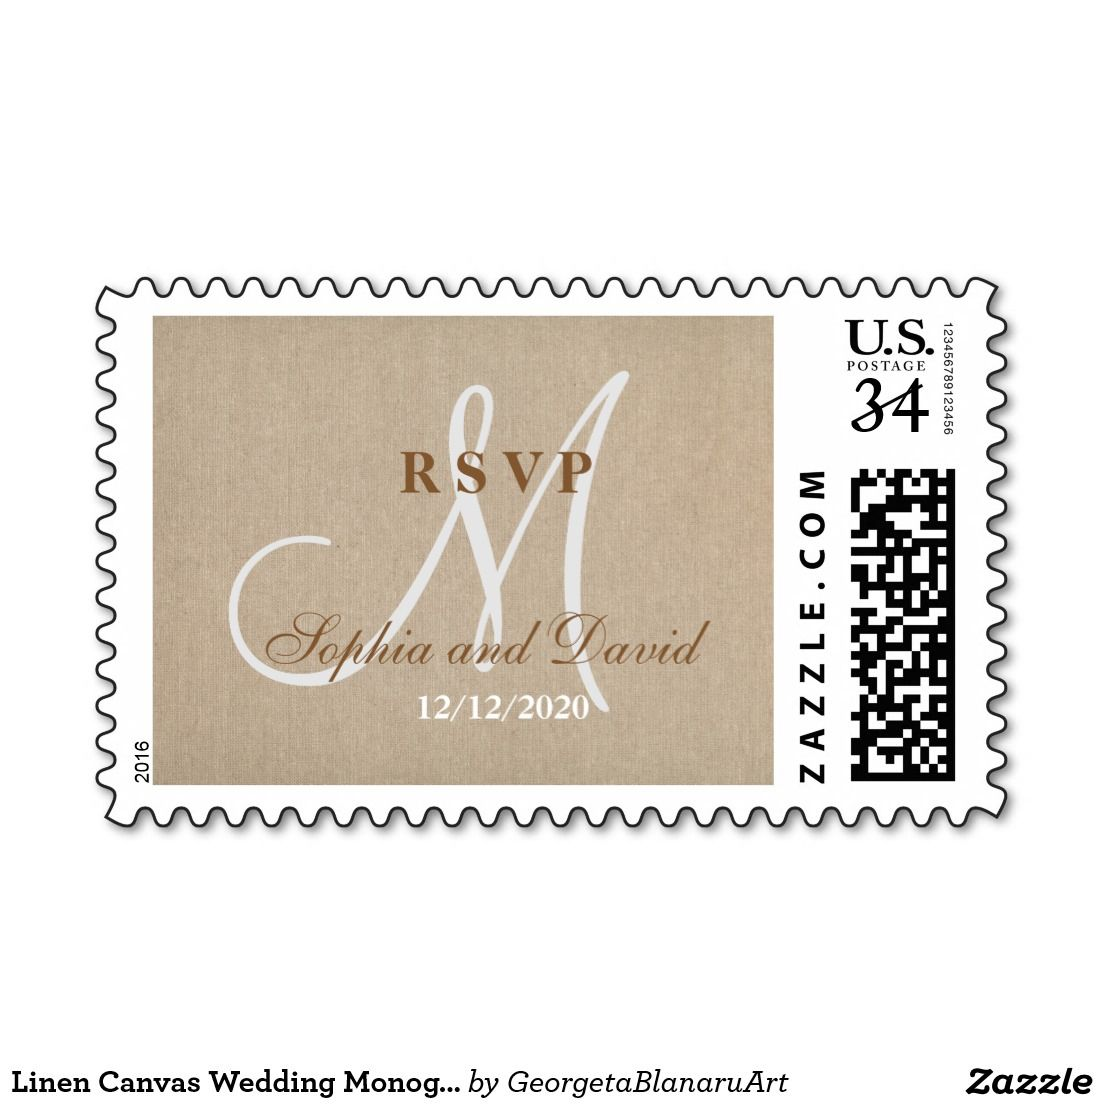 Linen Canvas Wedding Monogram Initial RSVP Postage Stamp   Wedding ...